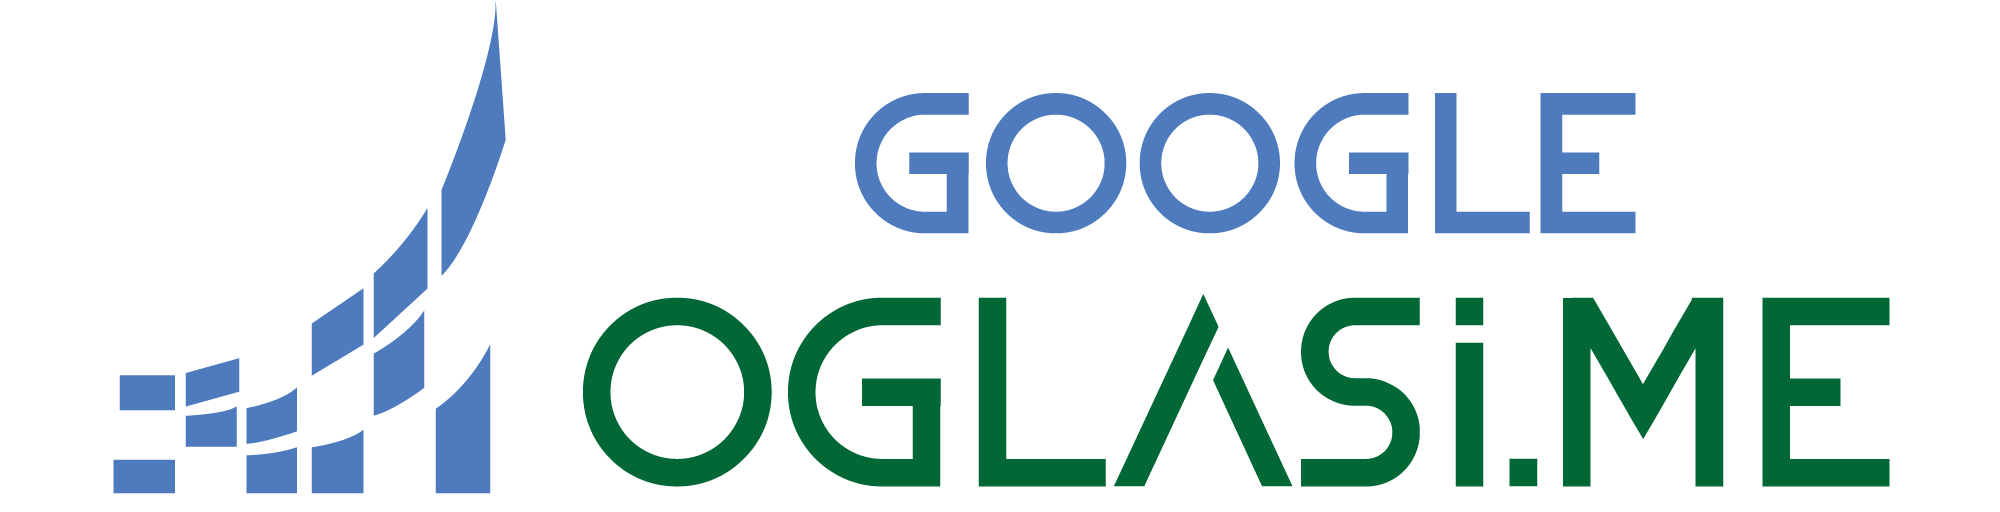 Google Oglasi - Google oglašavanje